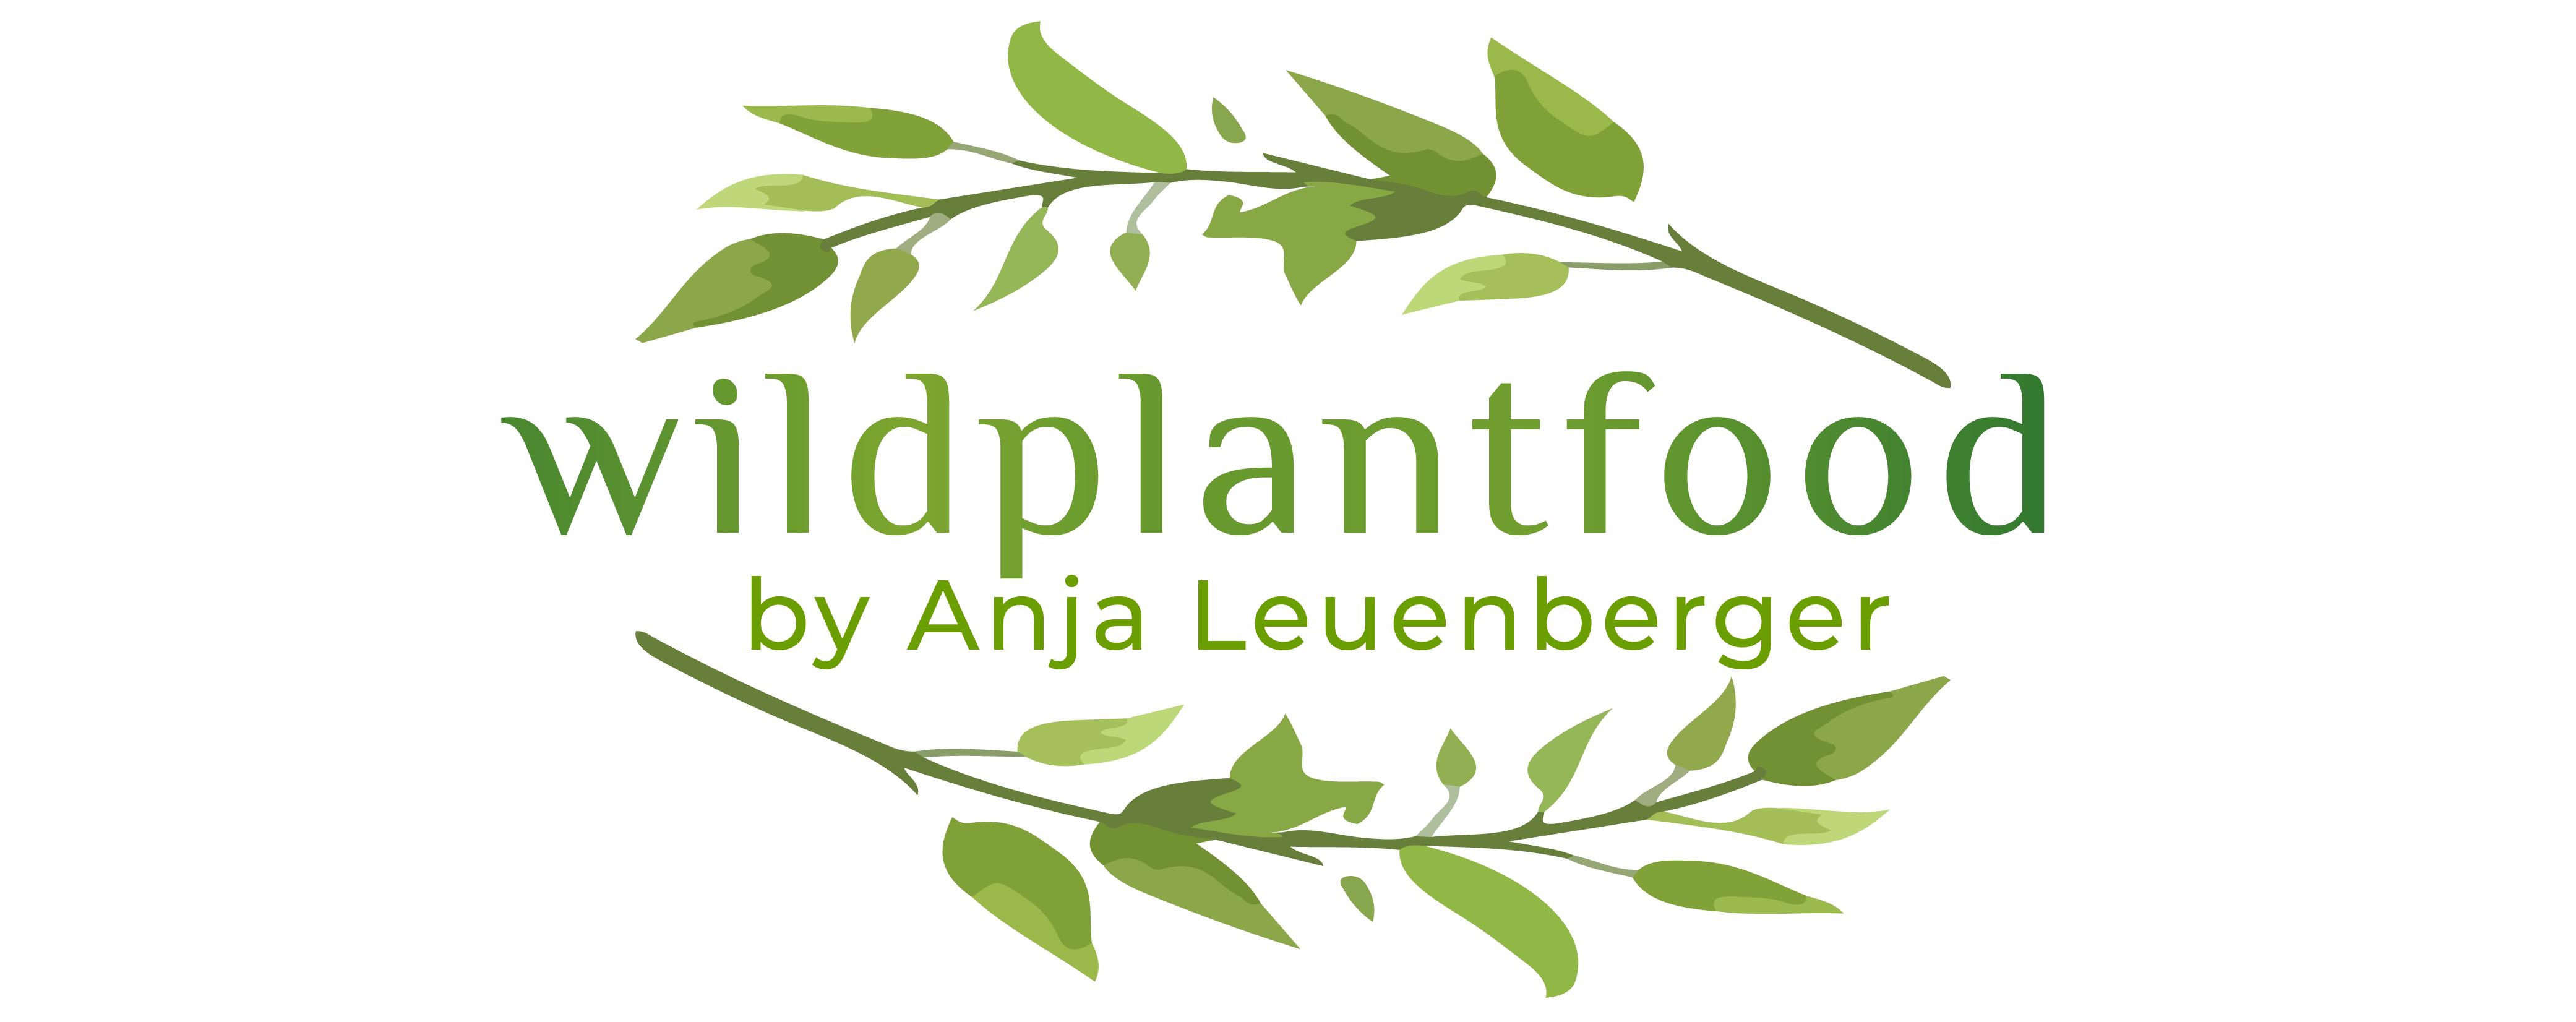 Wild Plant Food